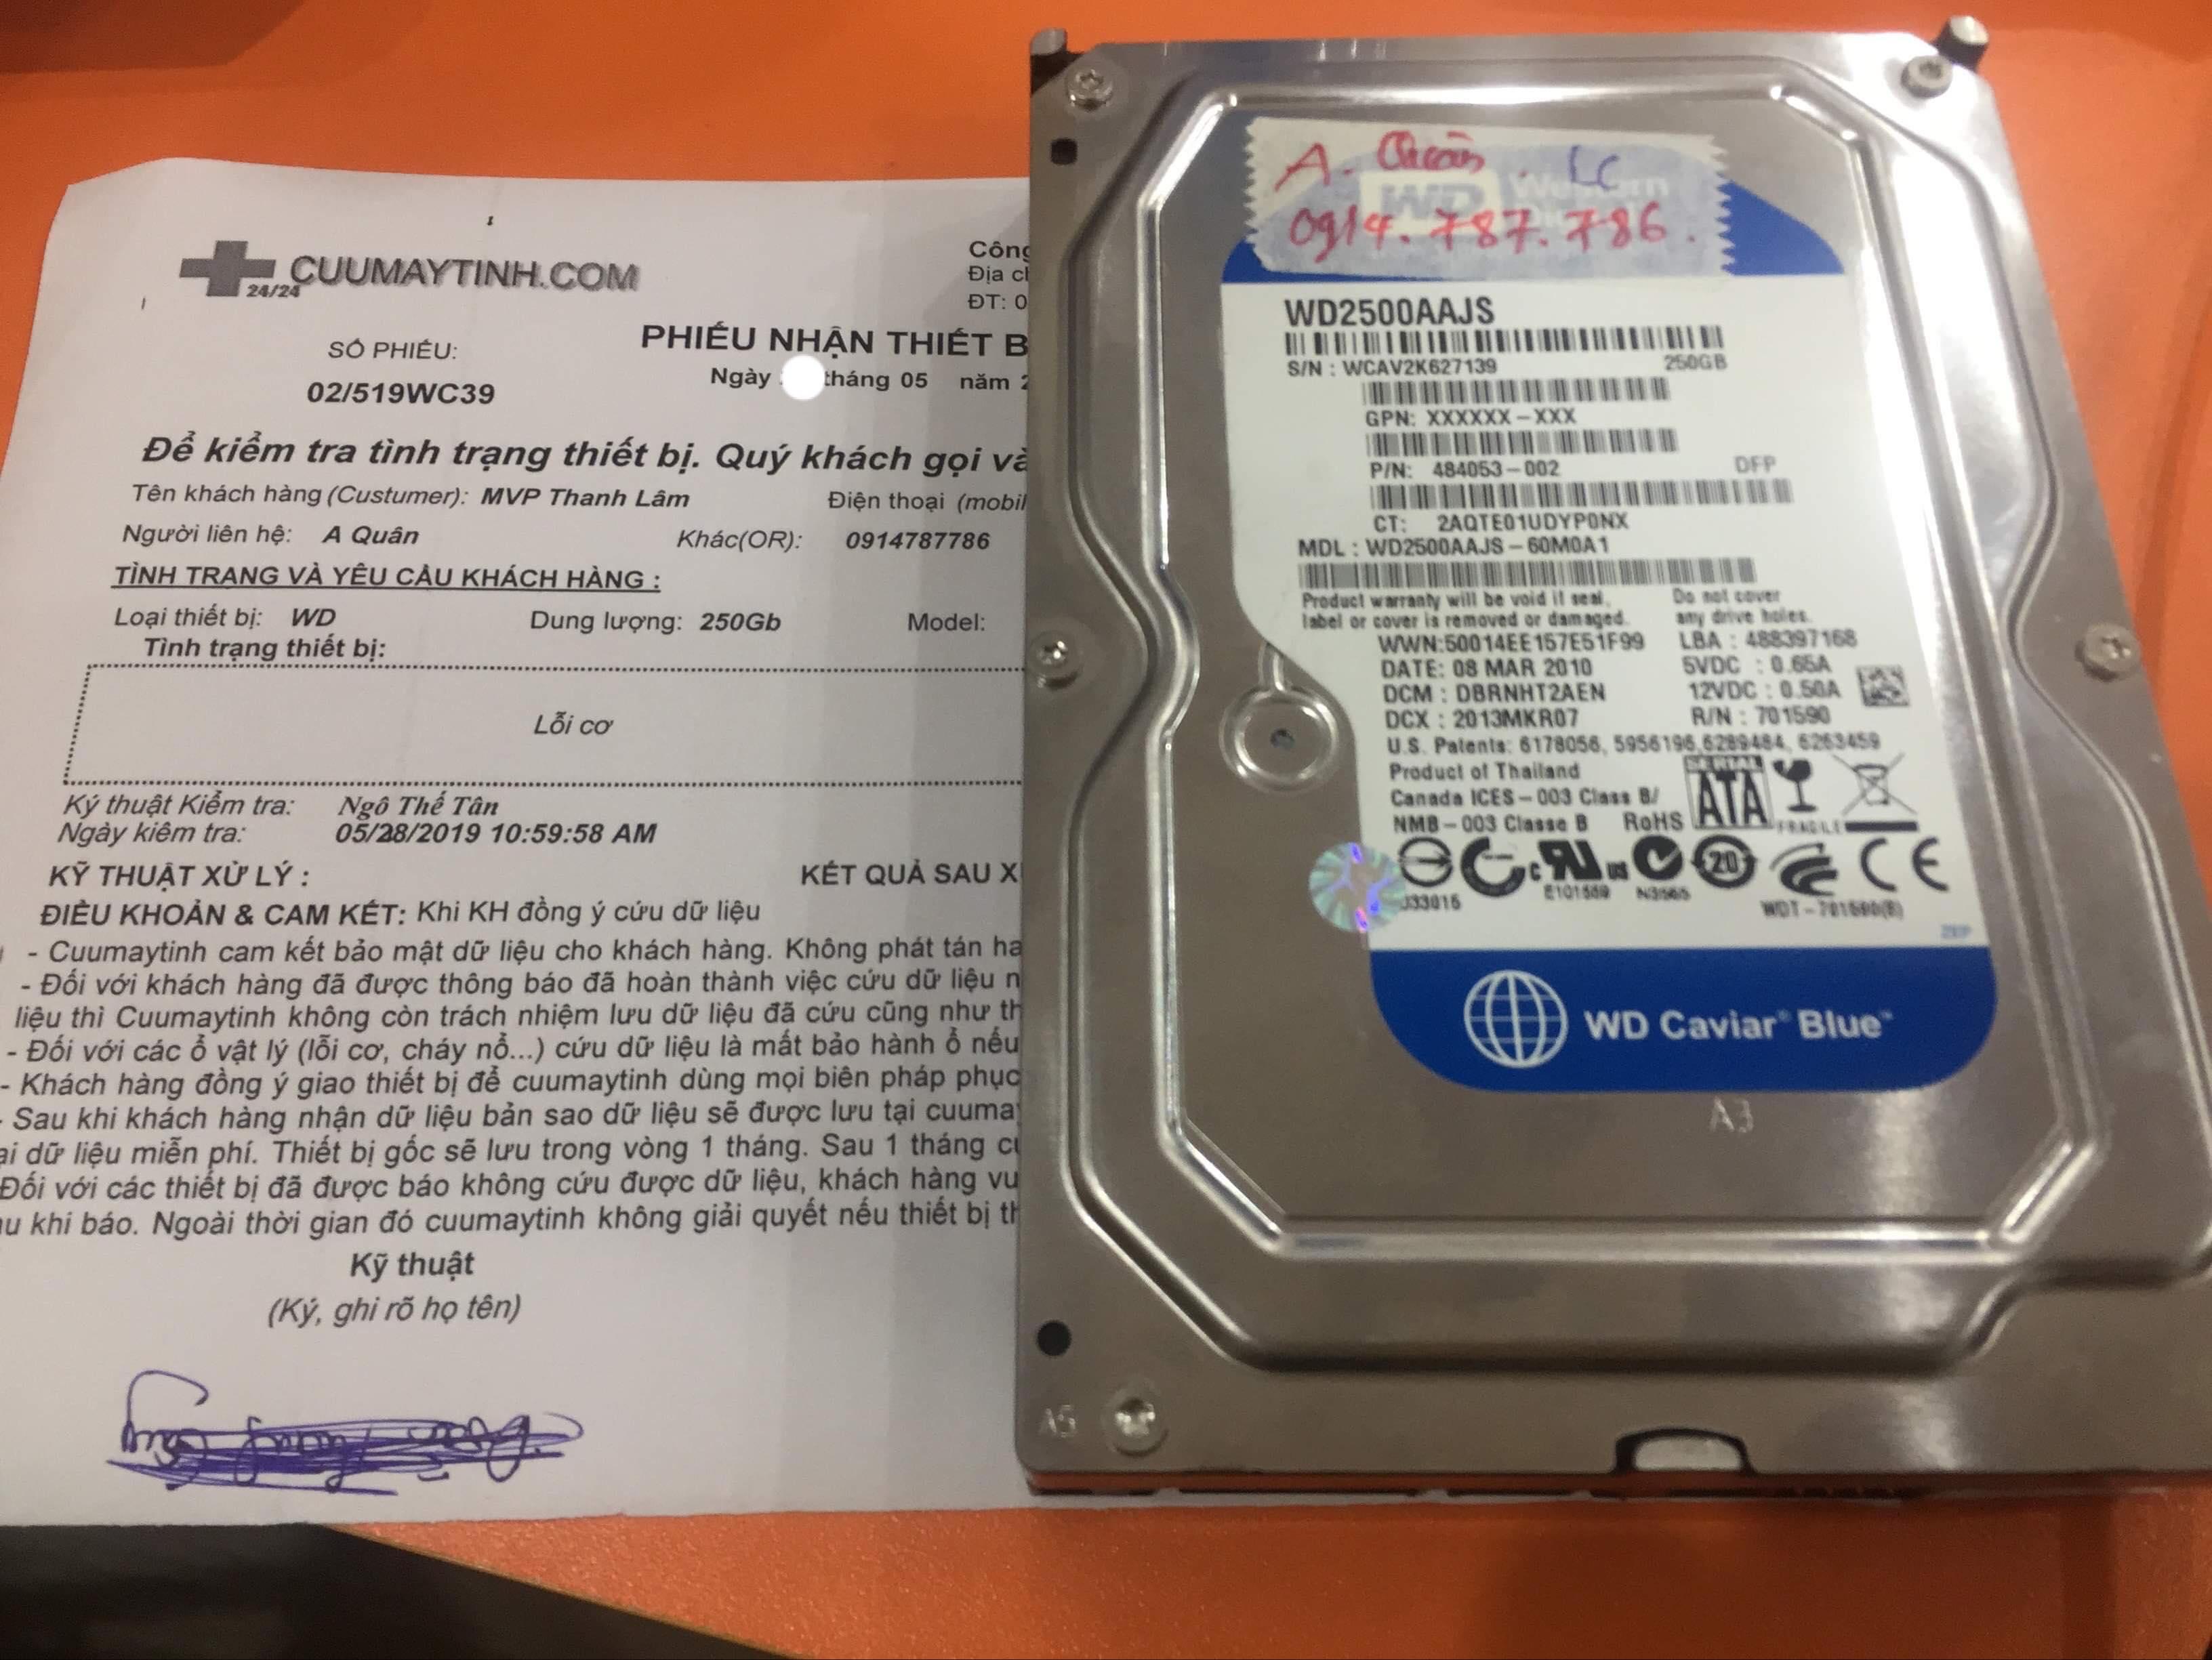 Cứu dữ liệu ổ cứng Western 250GB lỗi cơ 31/05/2019 - cuumaytinh